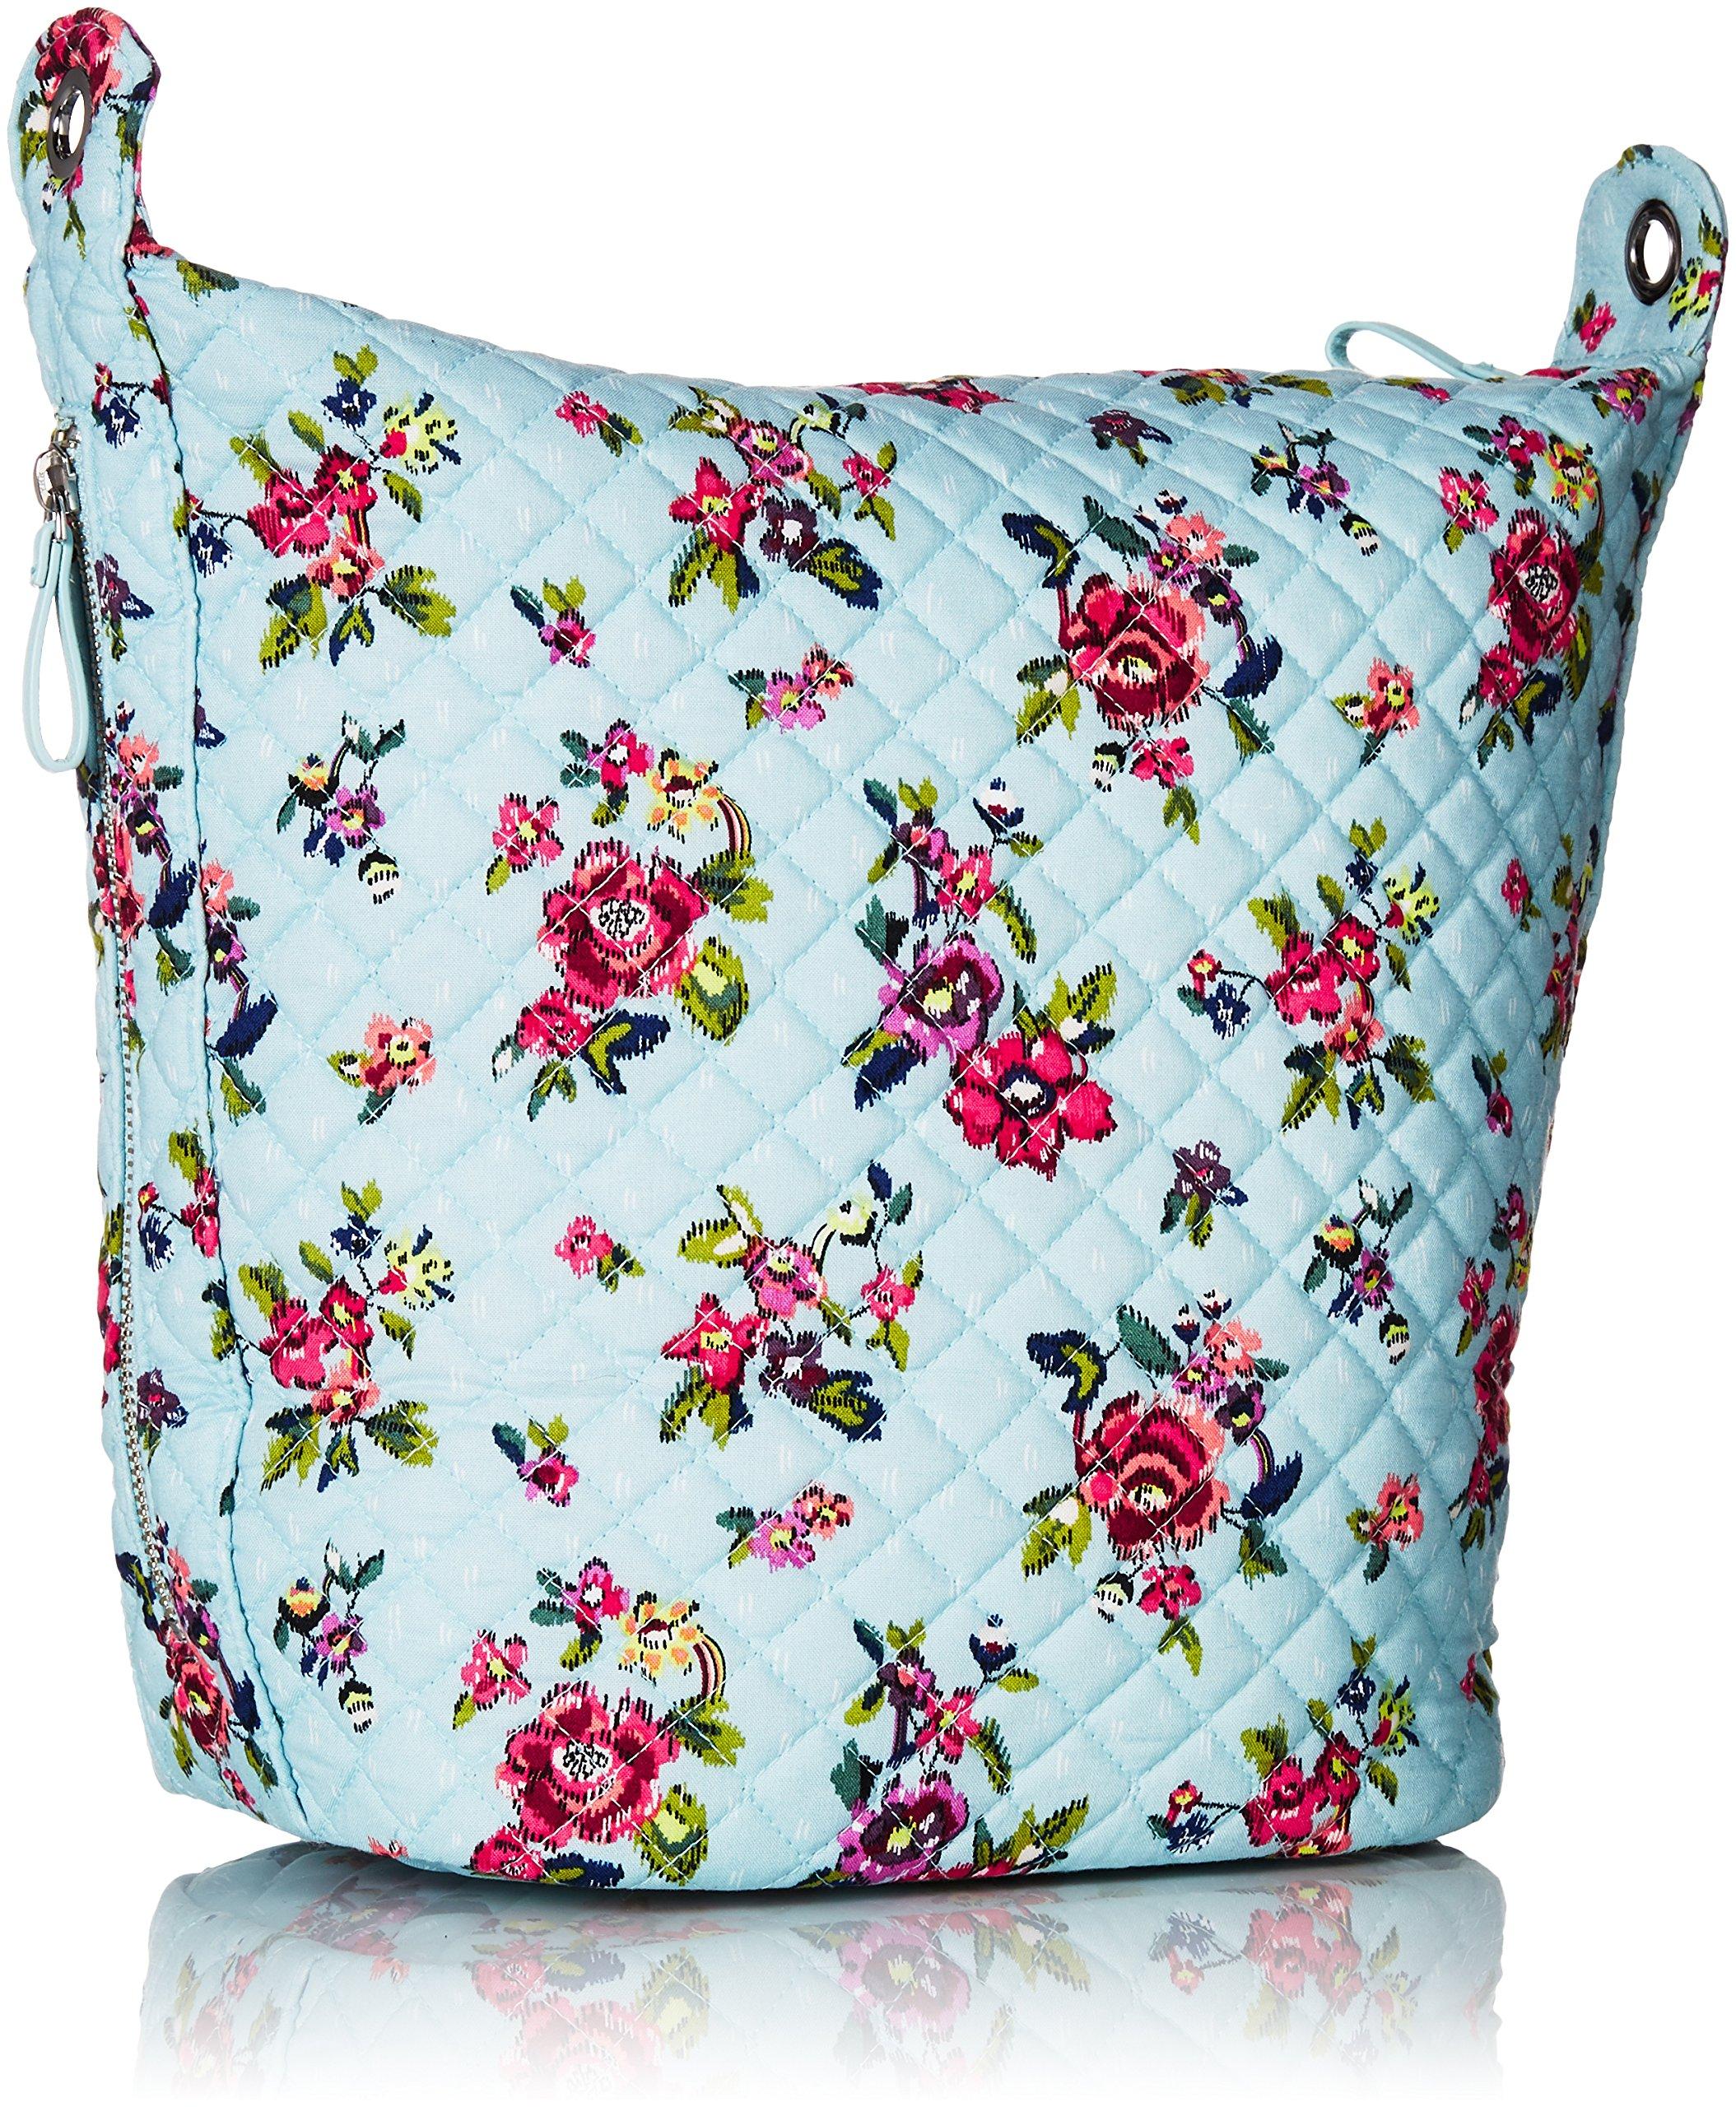 Vera Bradley Carson Hobo Bag, Signature Cotton, Water Bouquet by Vera Bradley (Image #2)